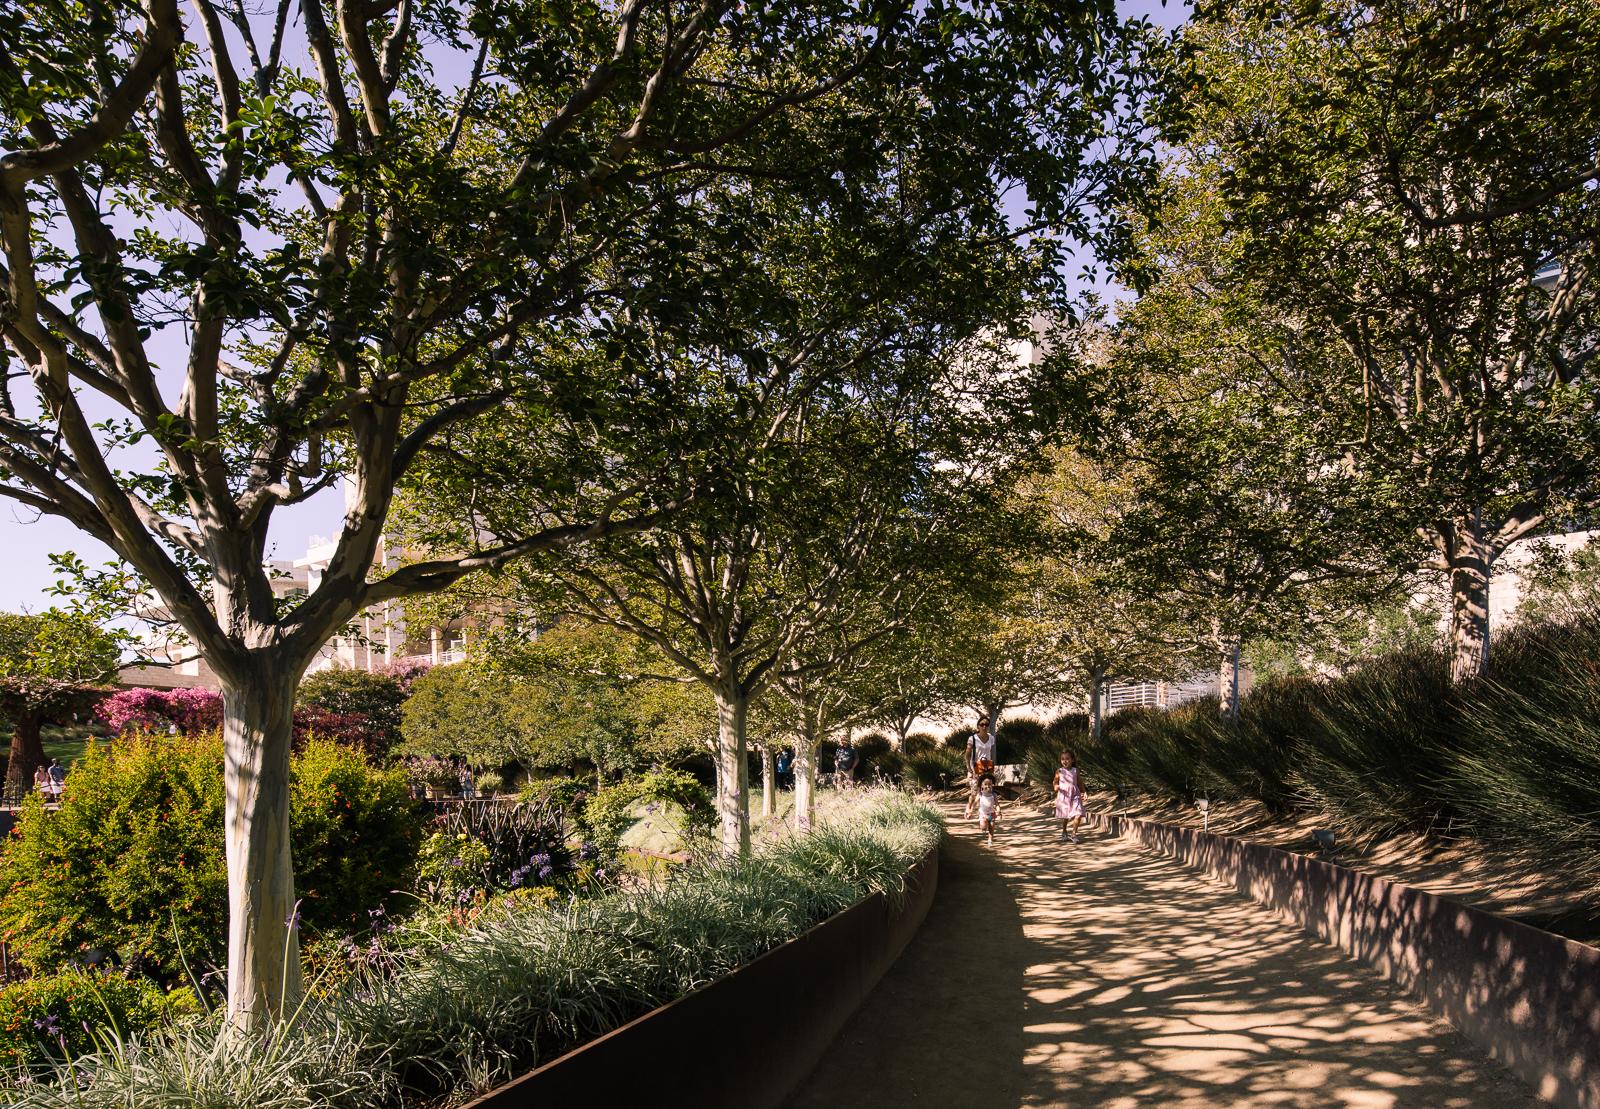 Amazing Garden created by artist Robert Irwin at the Getty Center